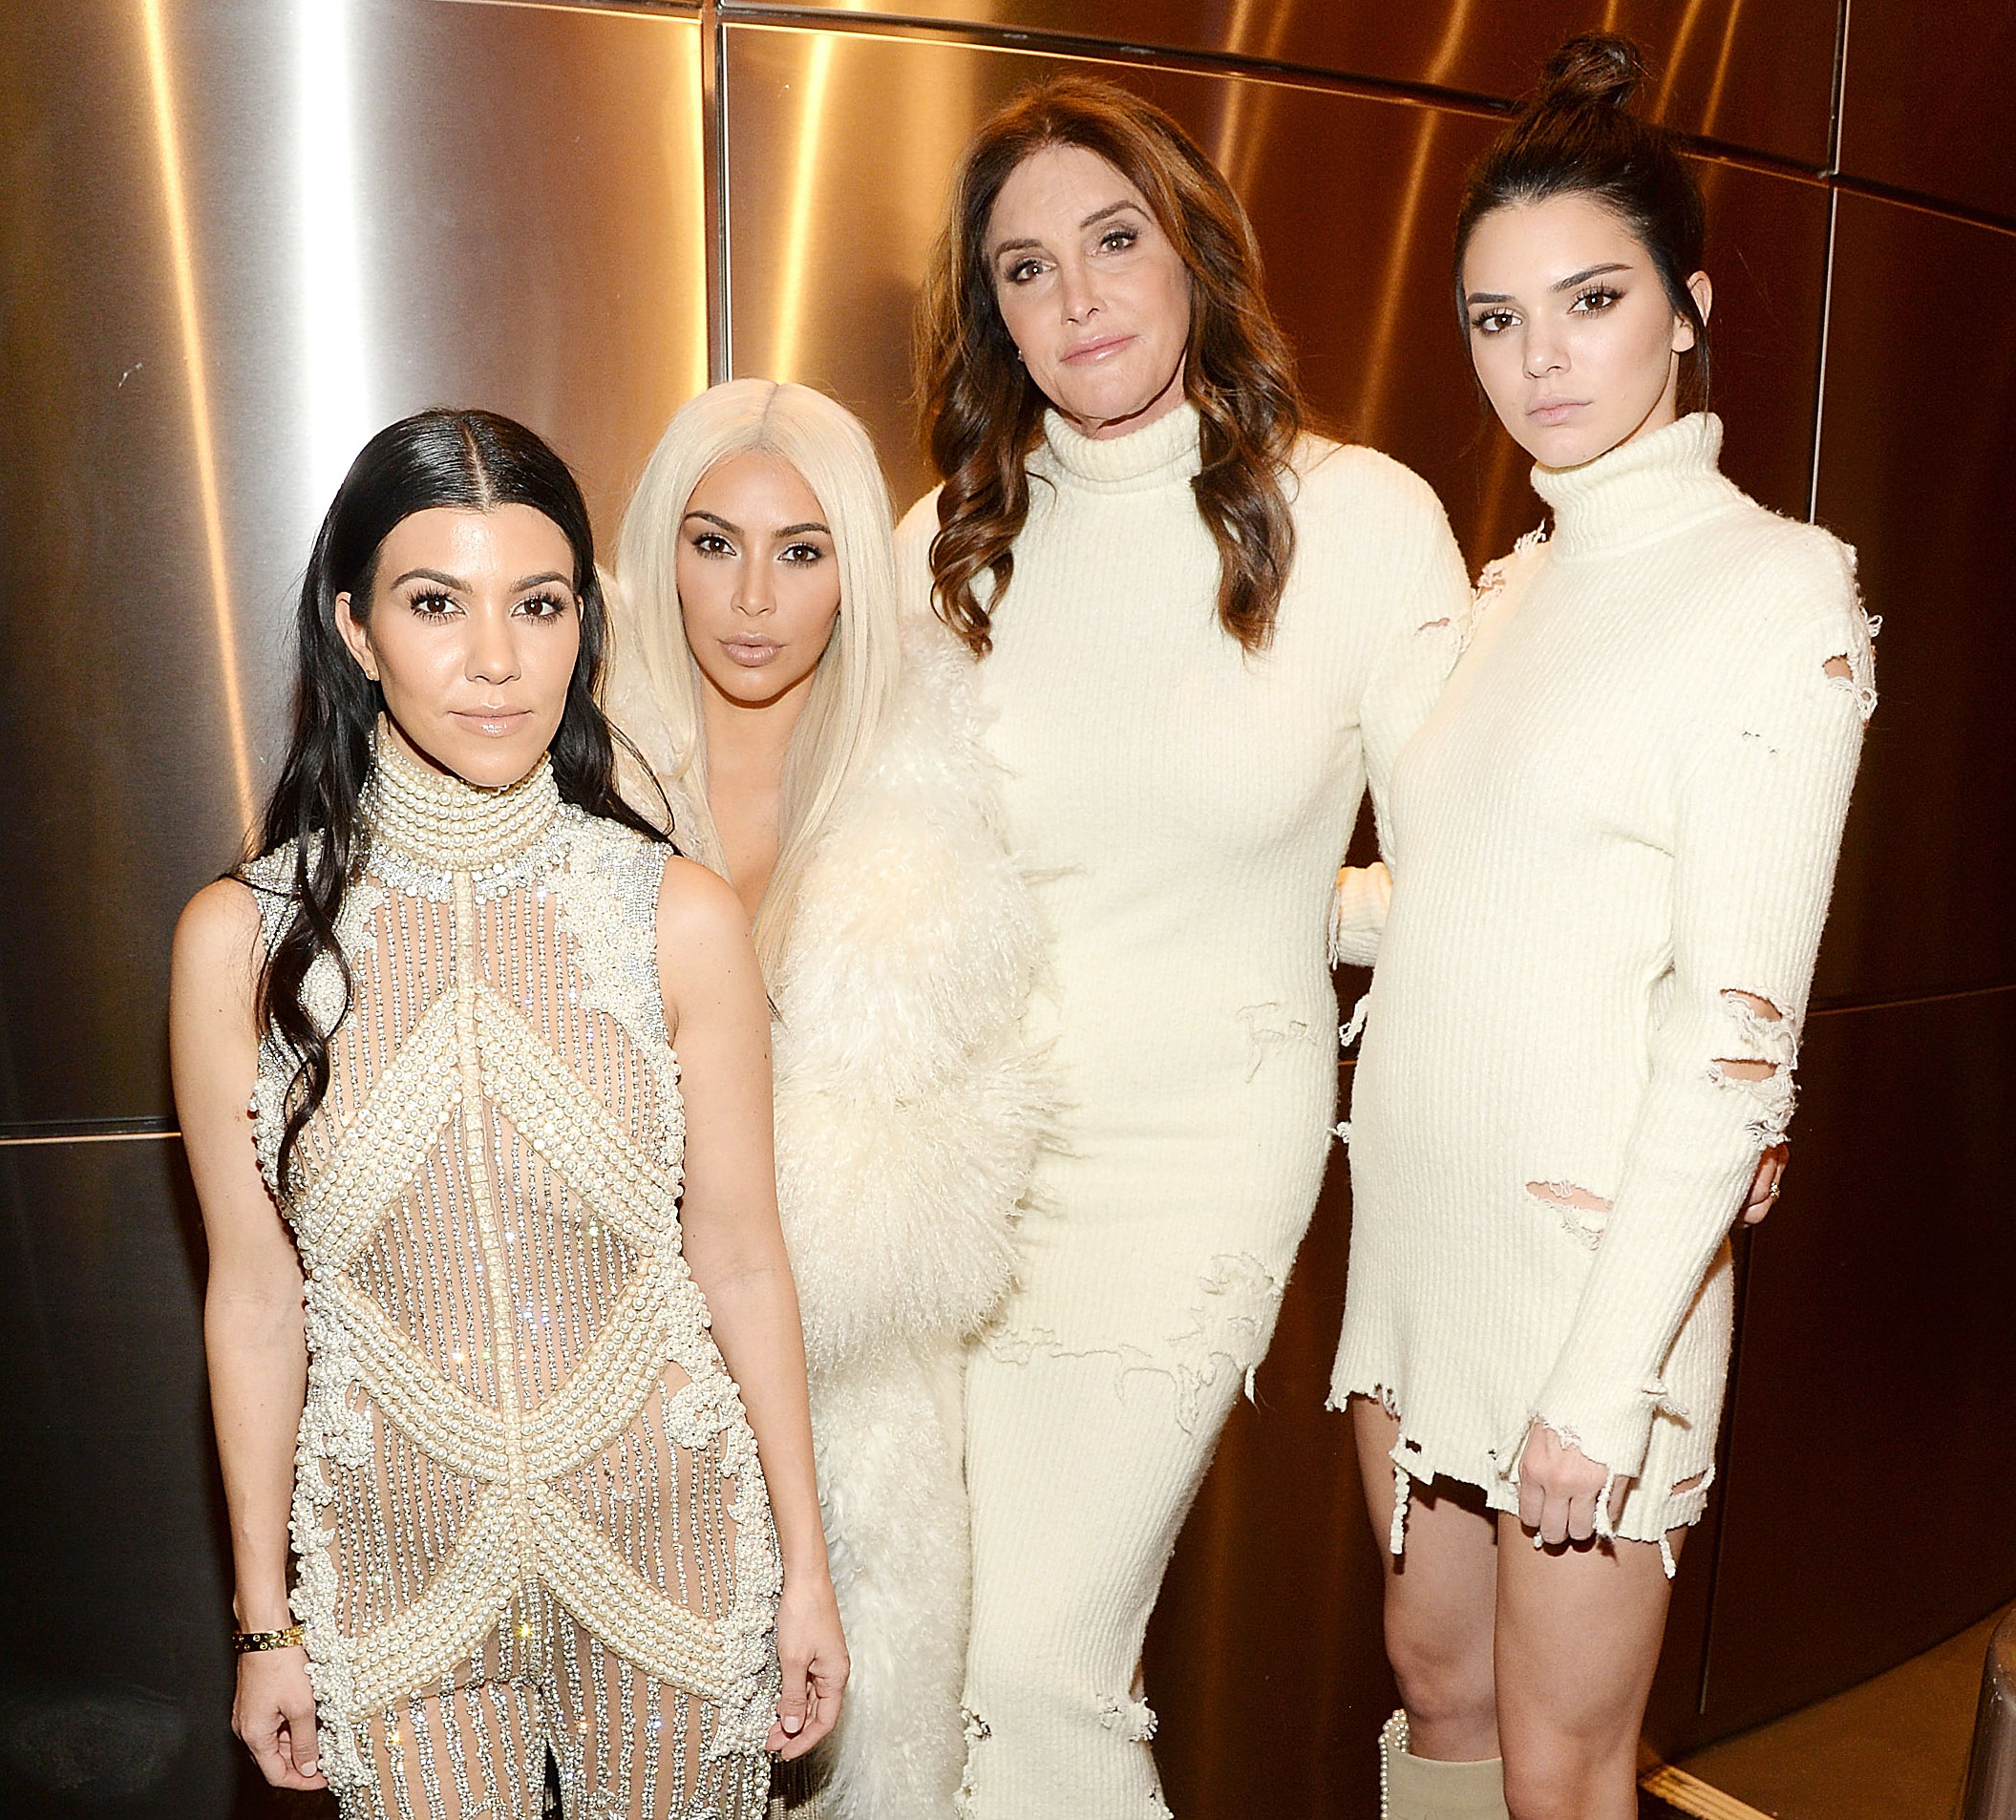 Kourtney Kardashian Kim Kardashian Kendall Jenner Caitlyn Jenner at Kanye West Yeezy Season 3 Seemingly Shades Tristan Thompson Fathers Day 2019